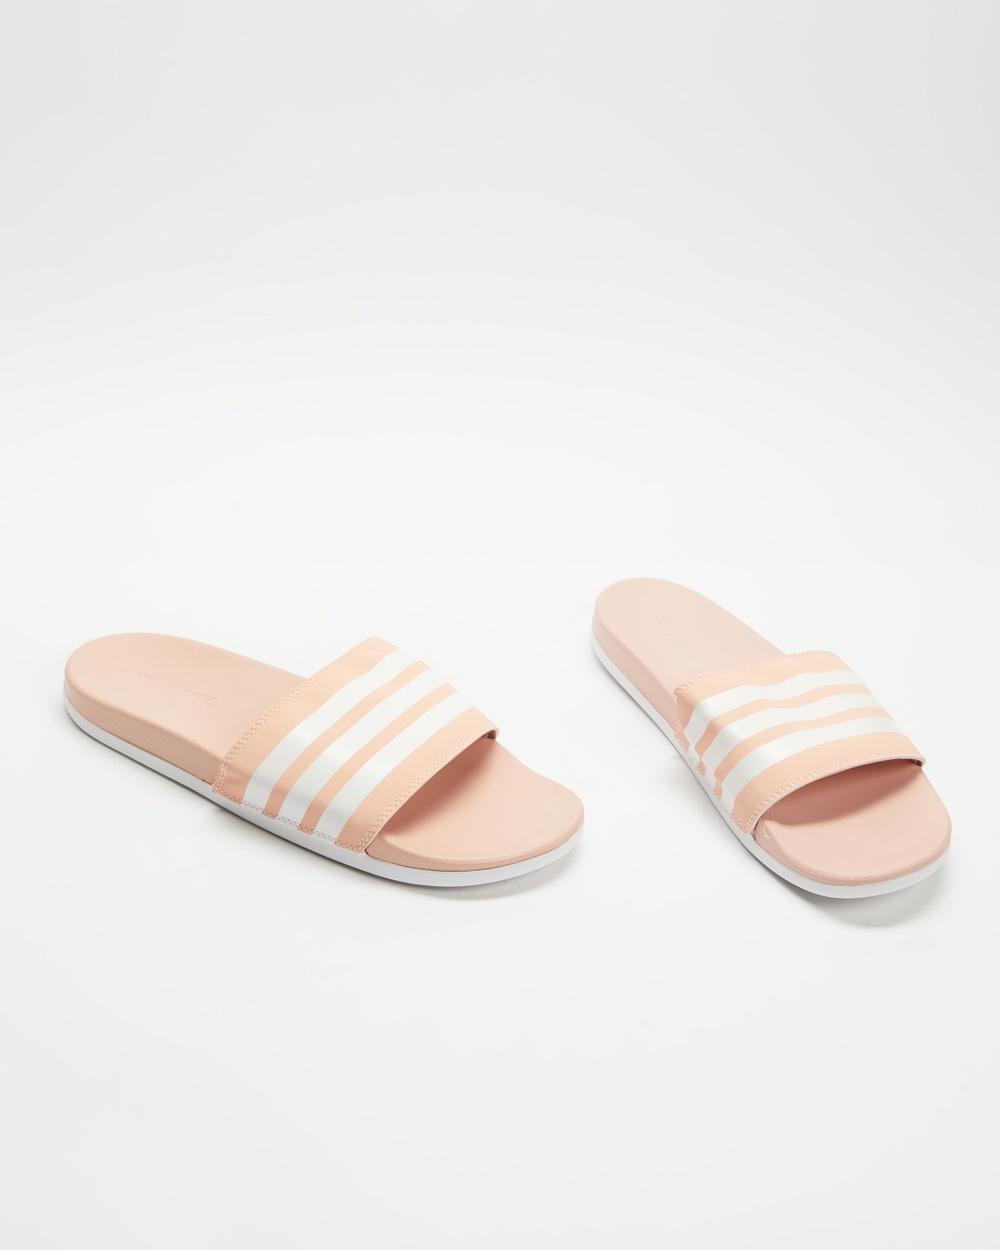 adidas Performance Adilette Comfort Slides Women's Vapour Pink & White